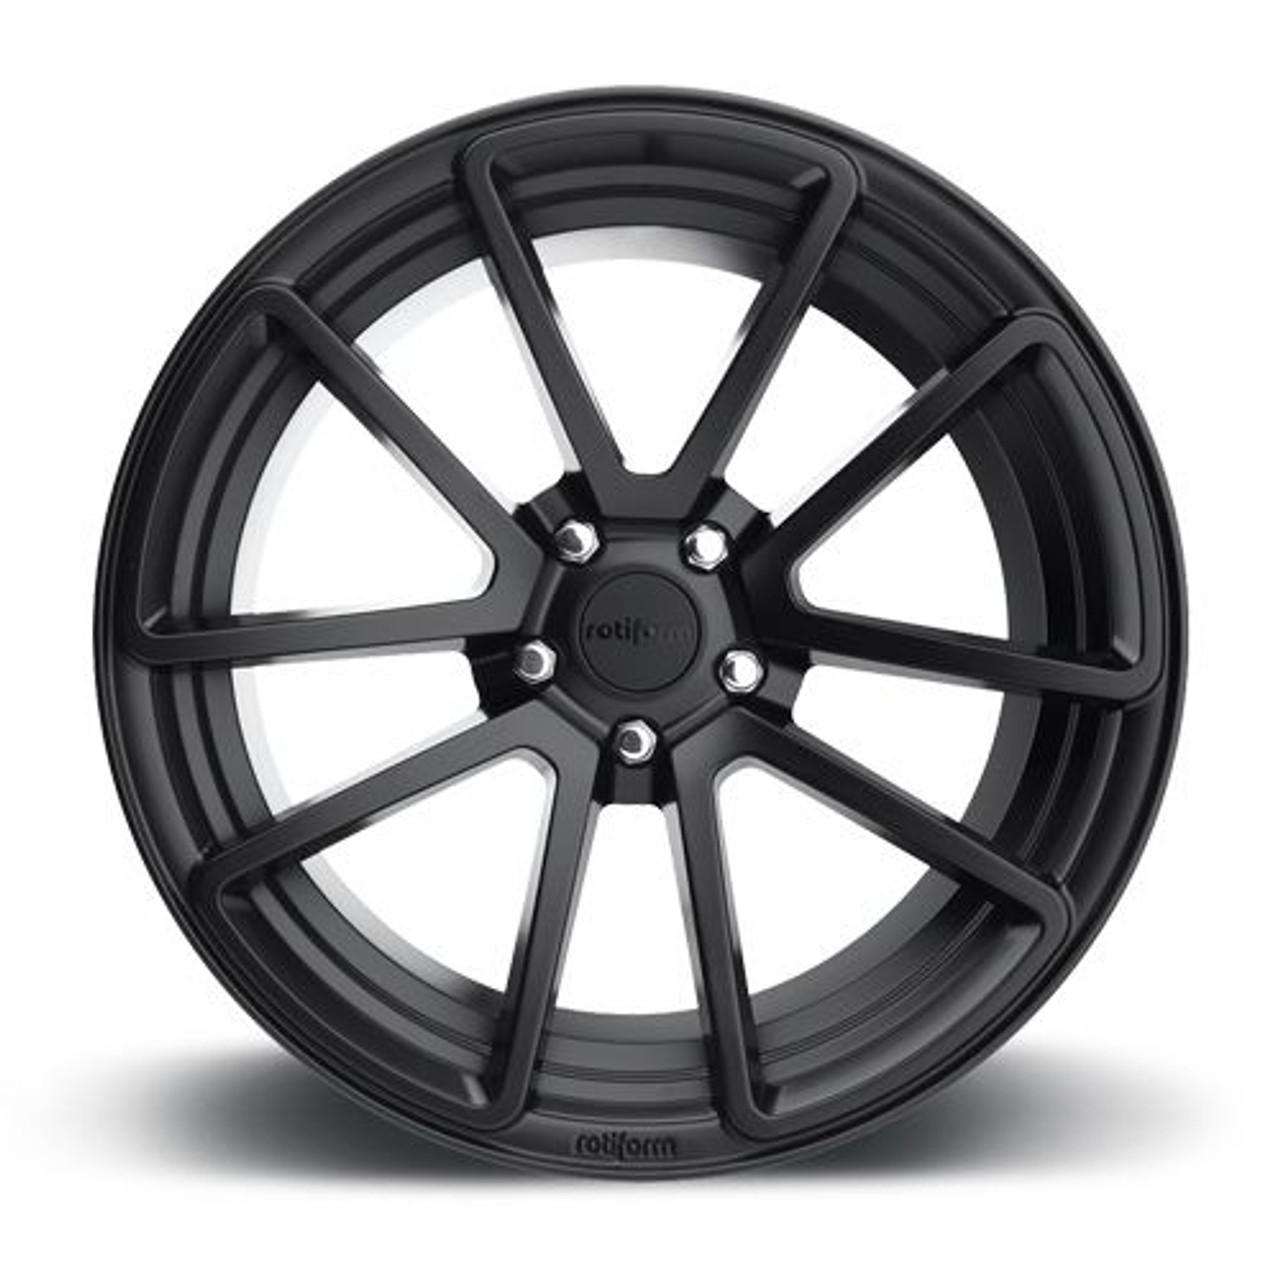 Rotiform Spf Wheels For Bmw 18 19 20 Matte Black 5x120mm Rotiform Spf Wheels For Bmw 18 19 20 Matte Black Finish 5x120mm